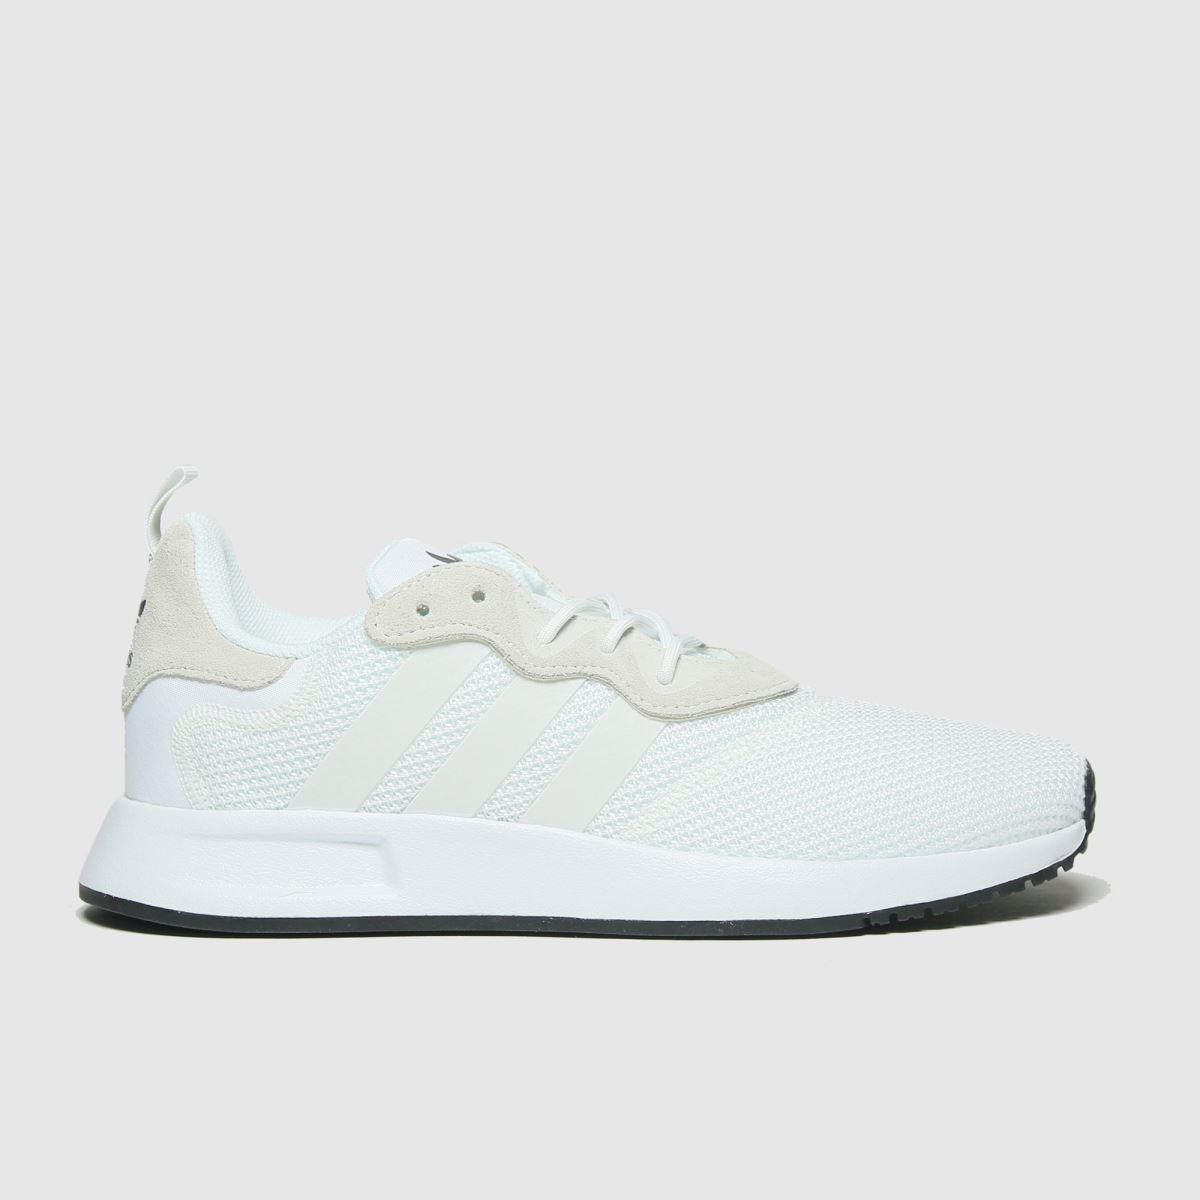 Adidas White X_plr S Trainers